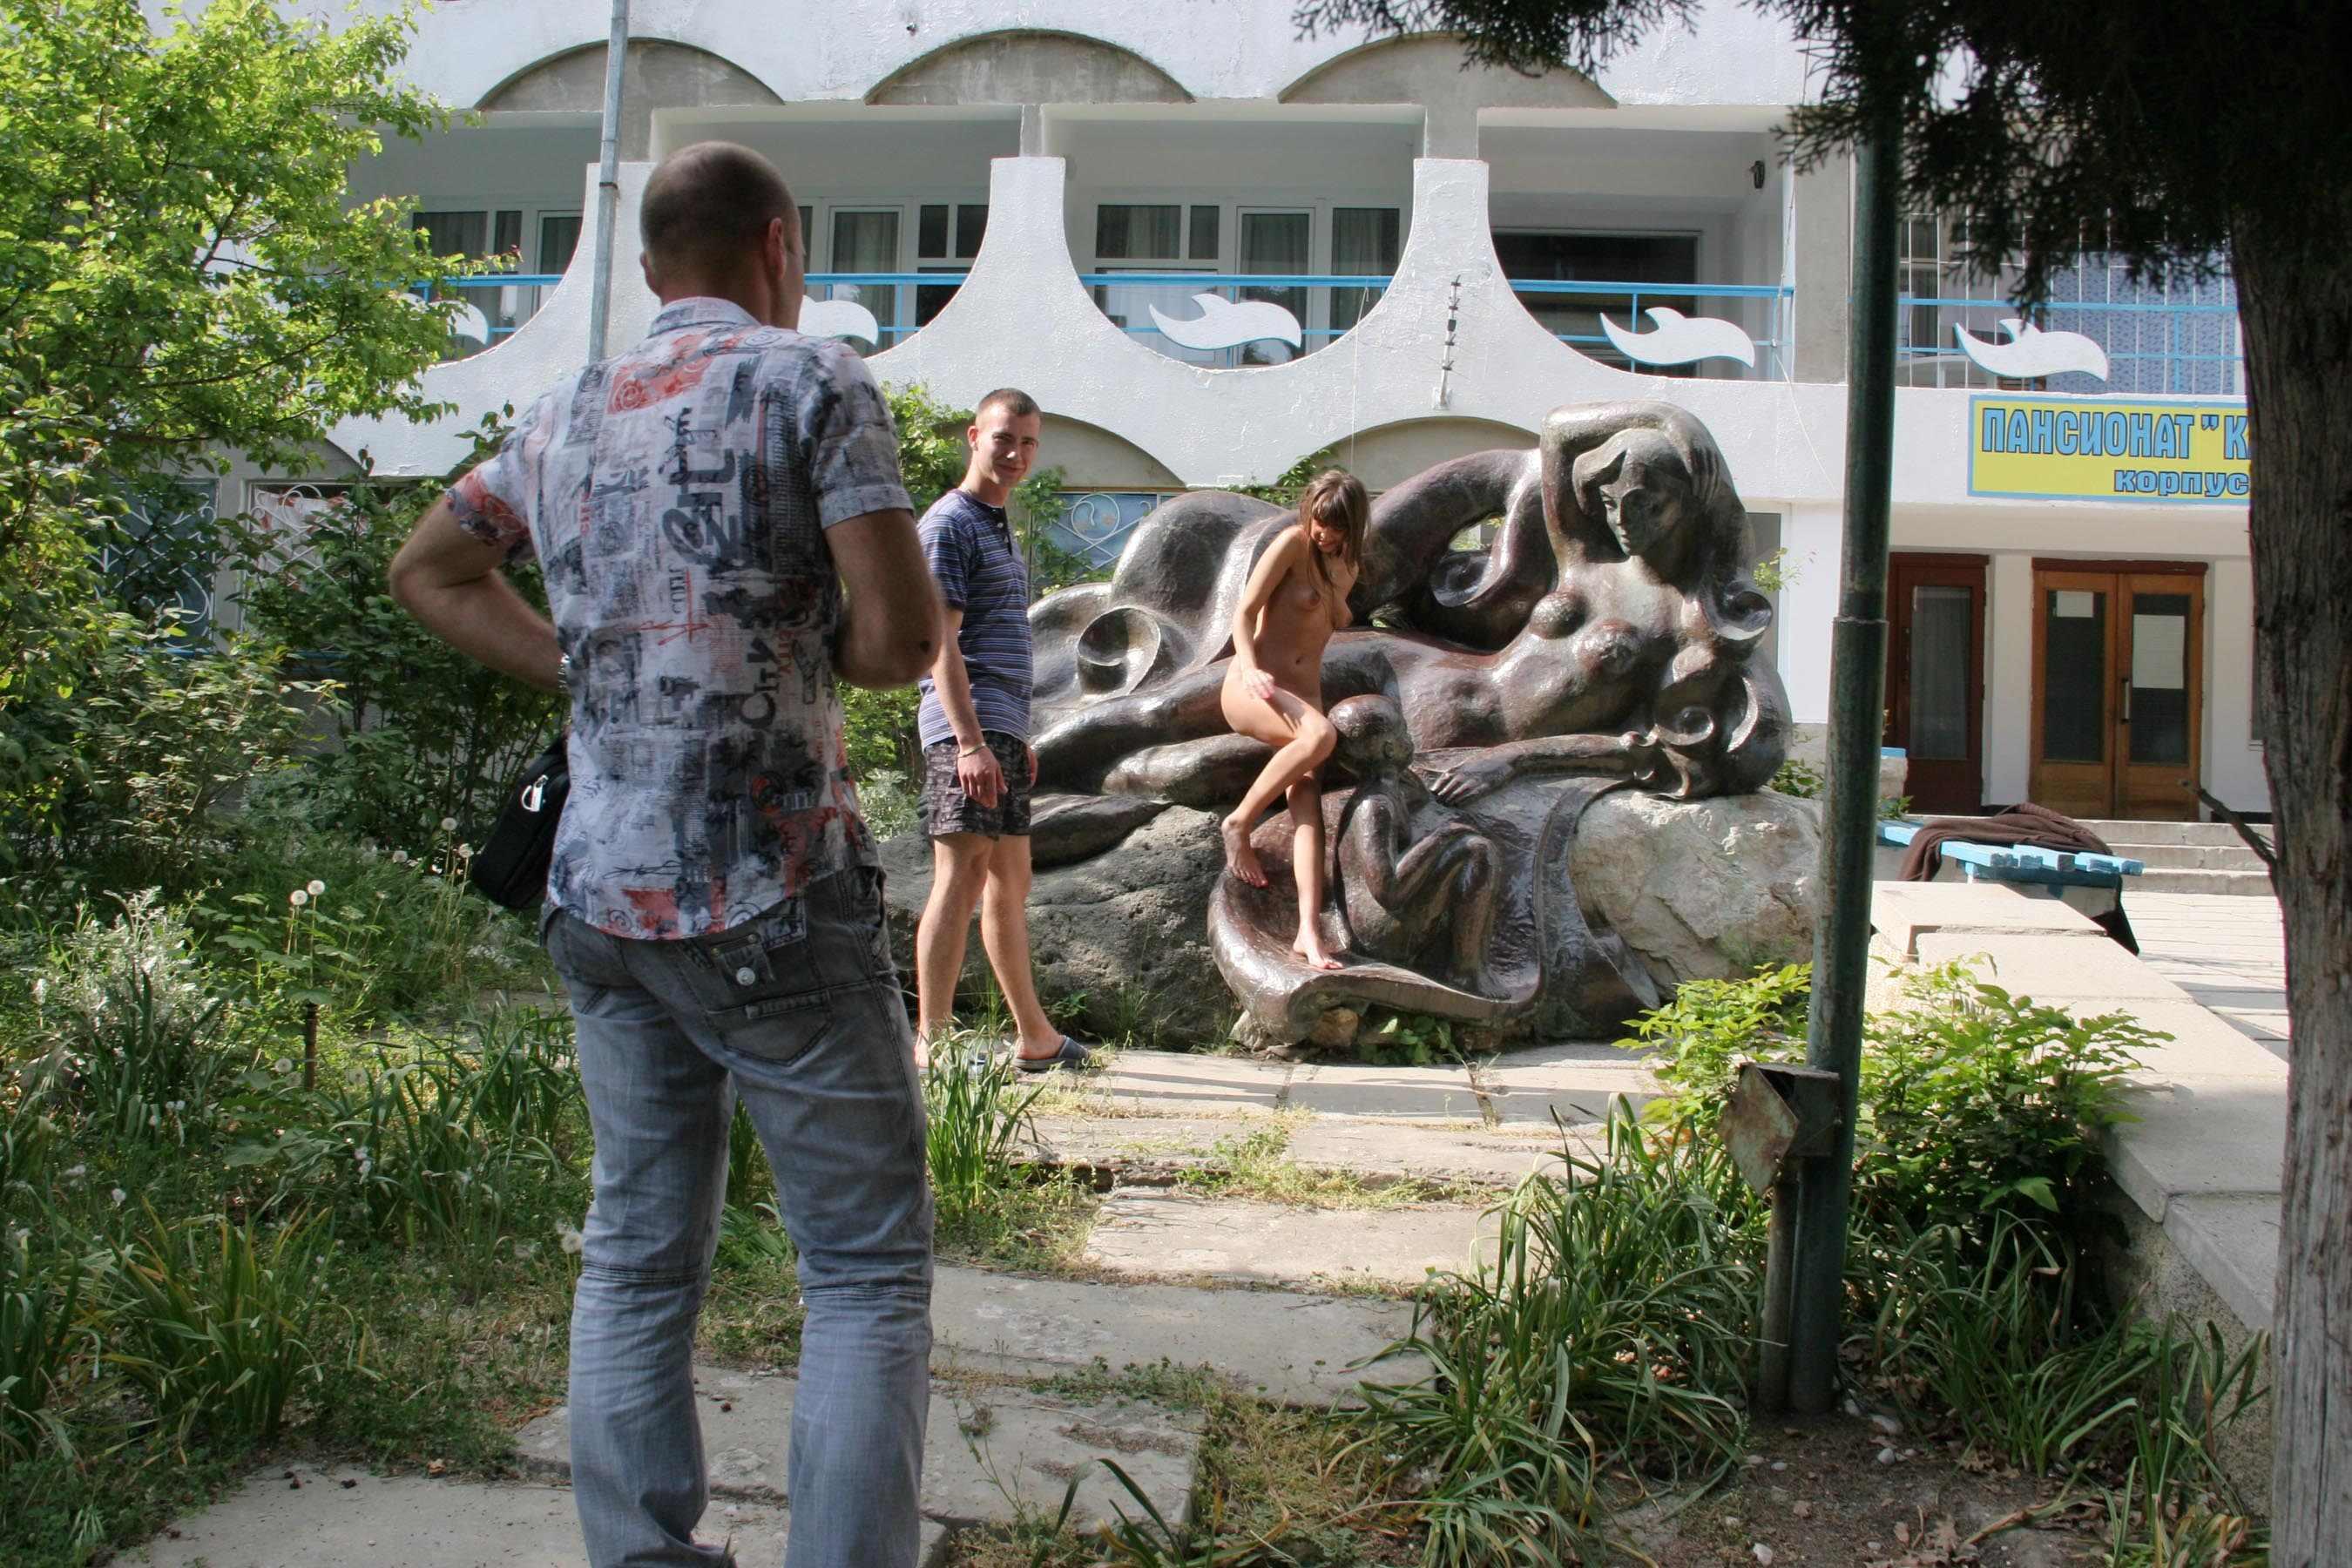 melena-crimean-holiday-public-nude-in-russia-14